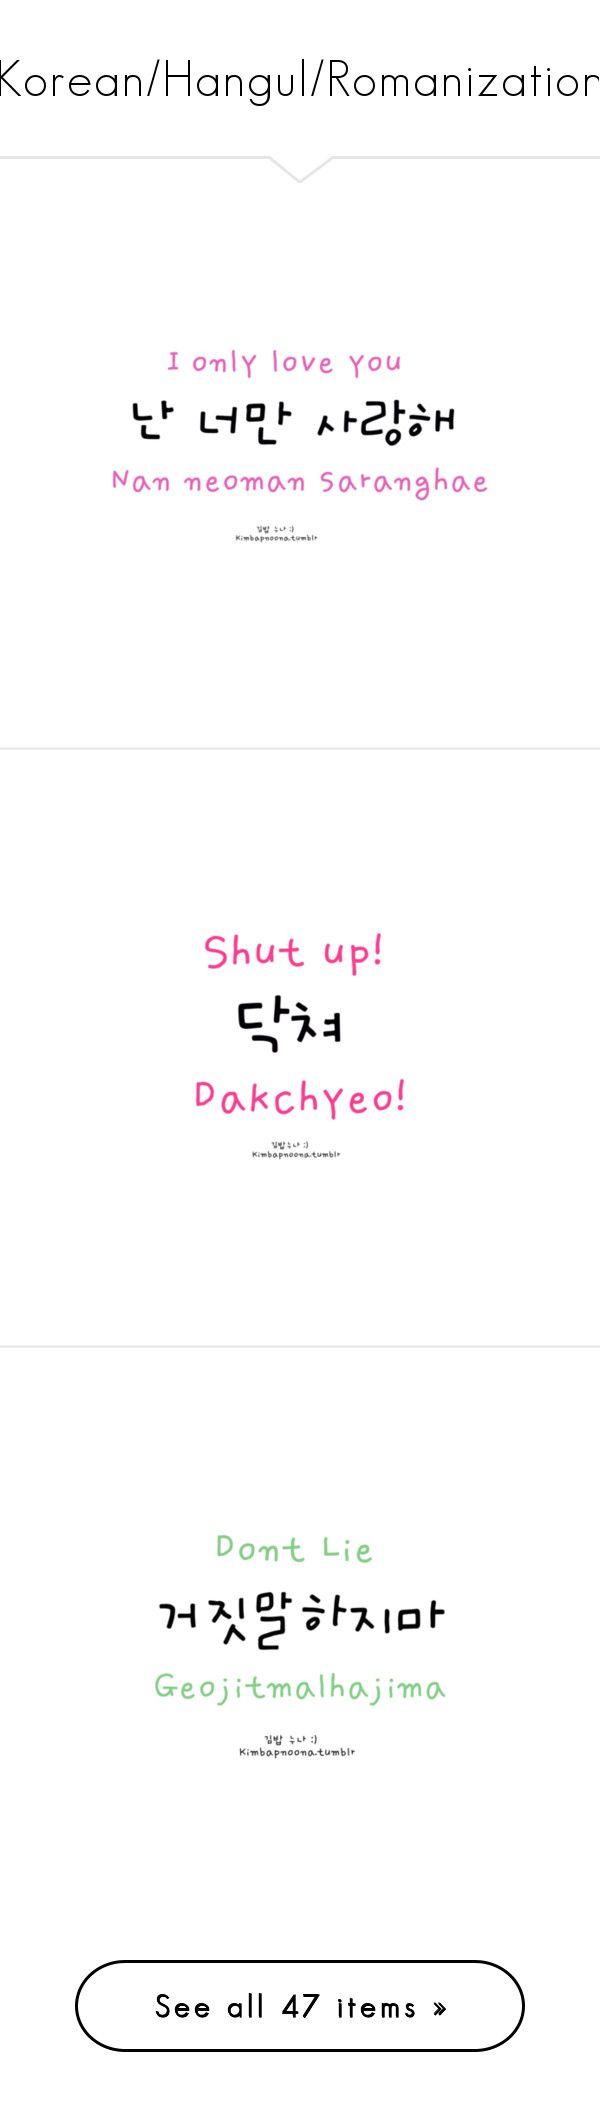 Koreanhangulromanization By Seohyun Anon Liked On Polyvore